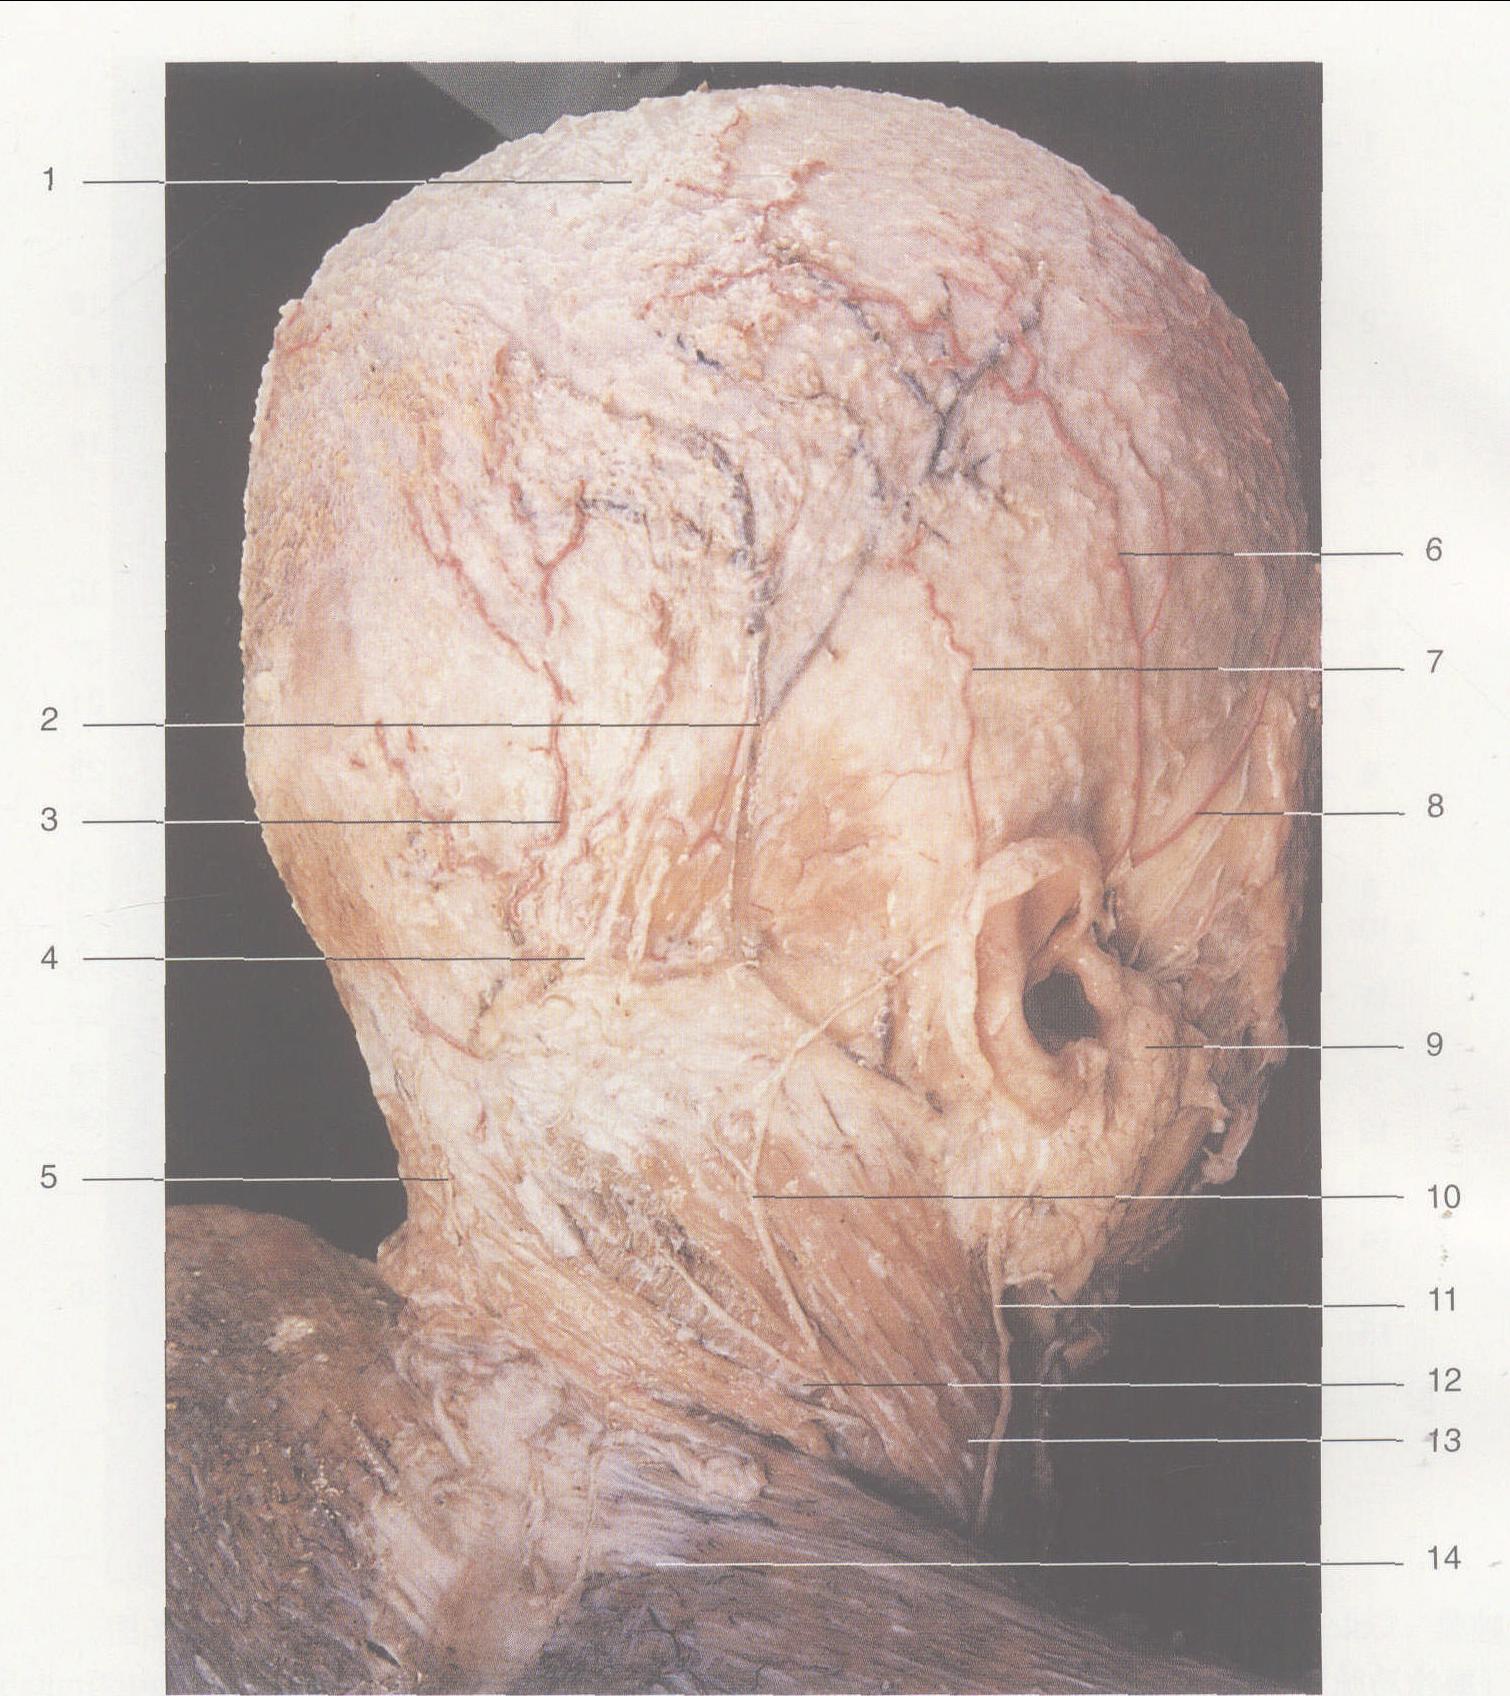 (图) 头颈部浅层结构 (侧一后观) : 1帽状腱膜 Galea aponeurotica2耳后静脉 Posterior auricular v.3枕动脉 Occipital a.4枕大神经 Greater occipital n.5第三枕神经 Third occipital n.6顶支 (颞浅动脉) Parietal branch (superficial tem-poral a.)7枕支 (耳后动脉) Occipital branch(posteri .